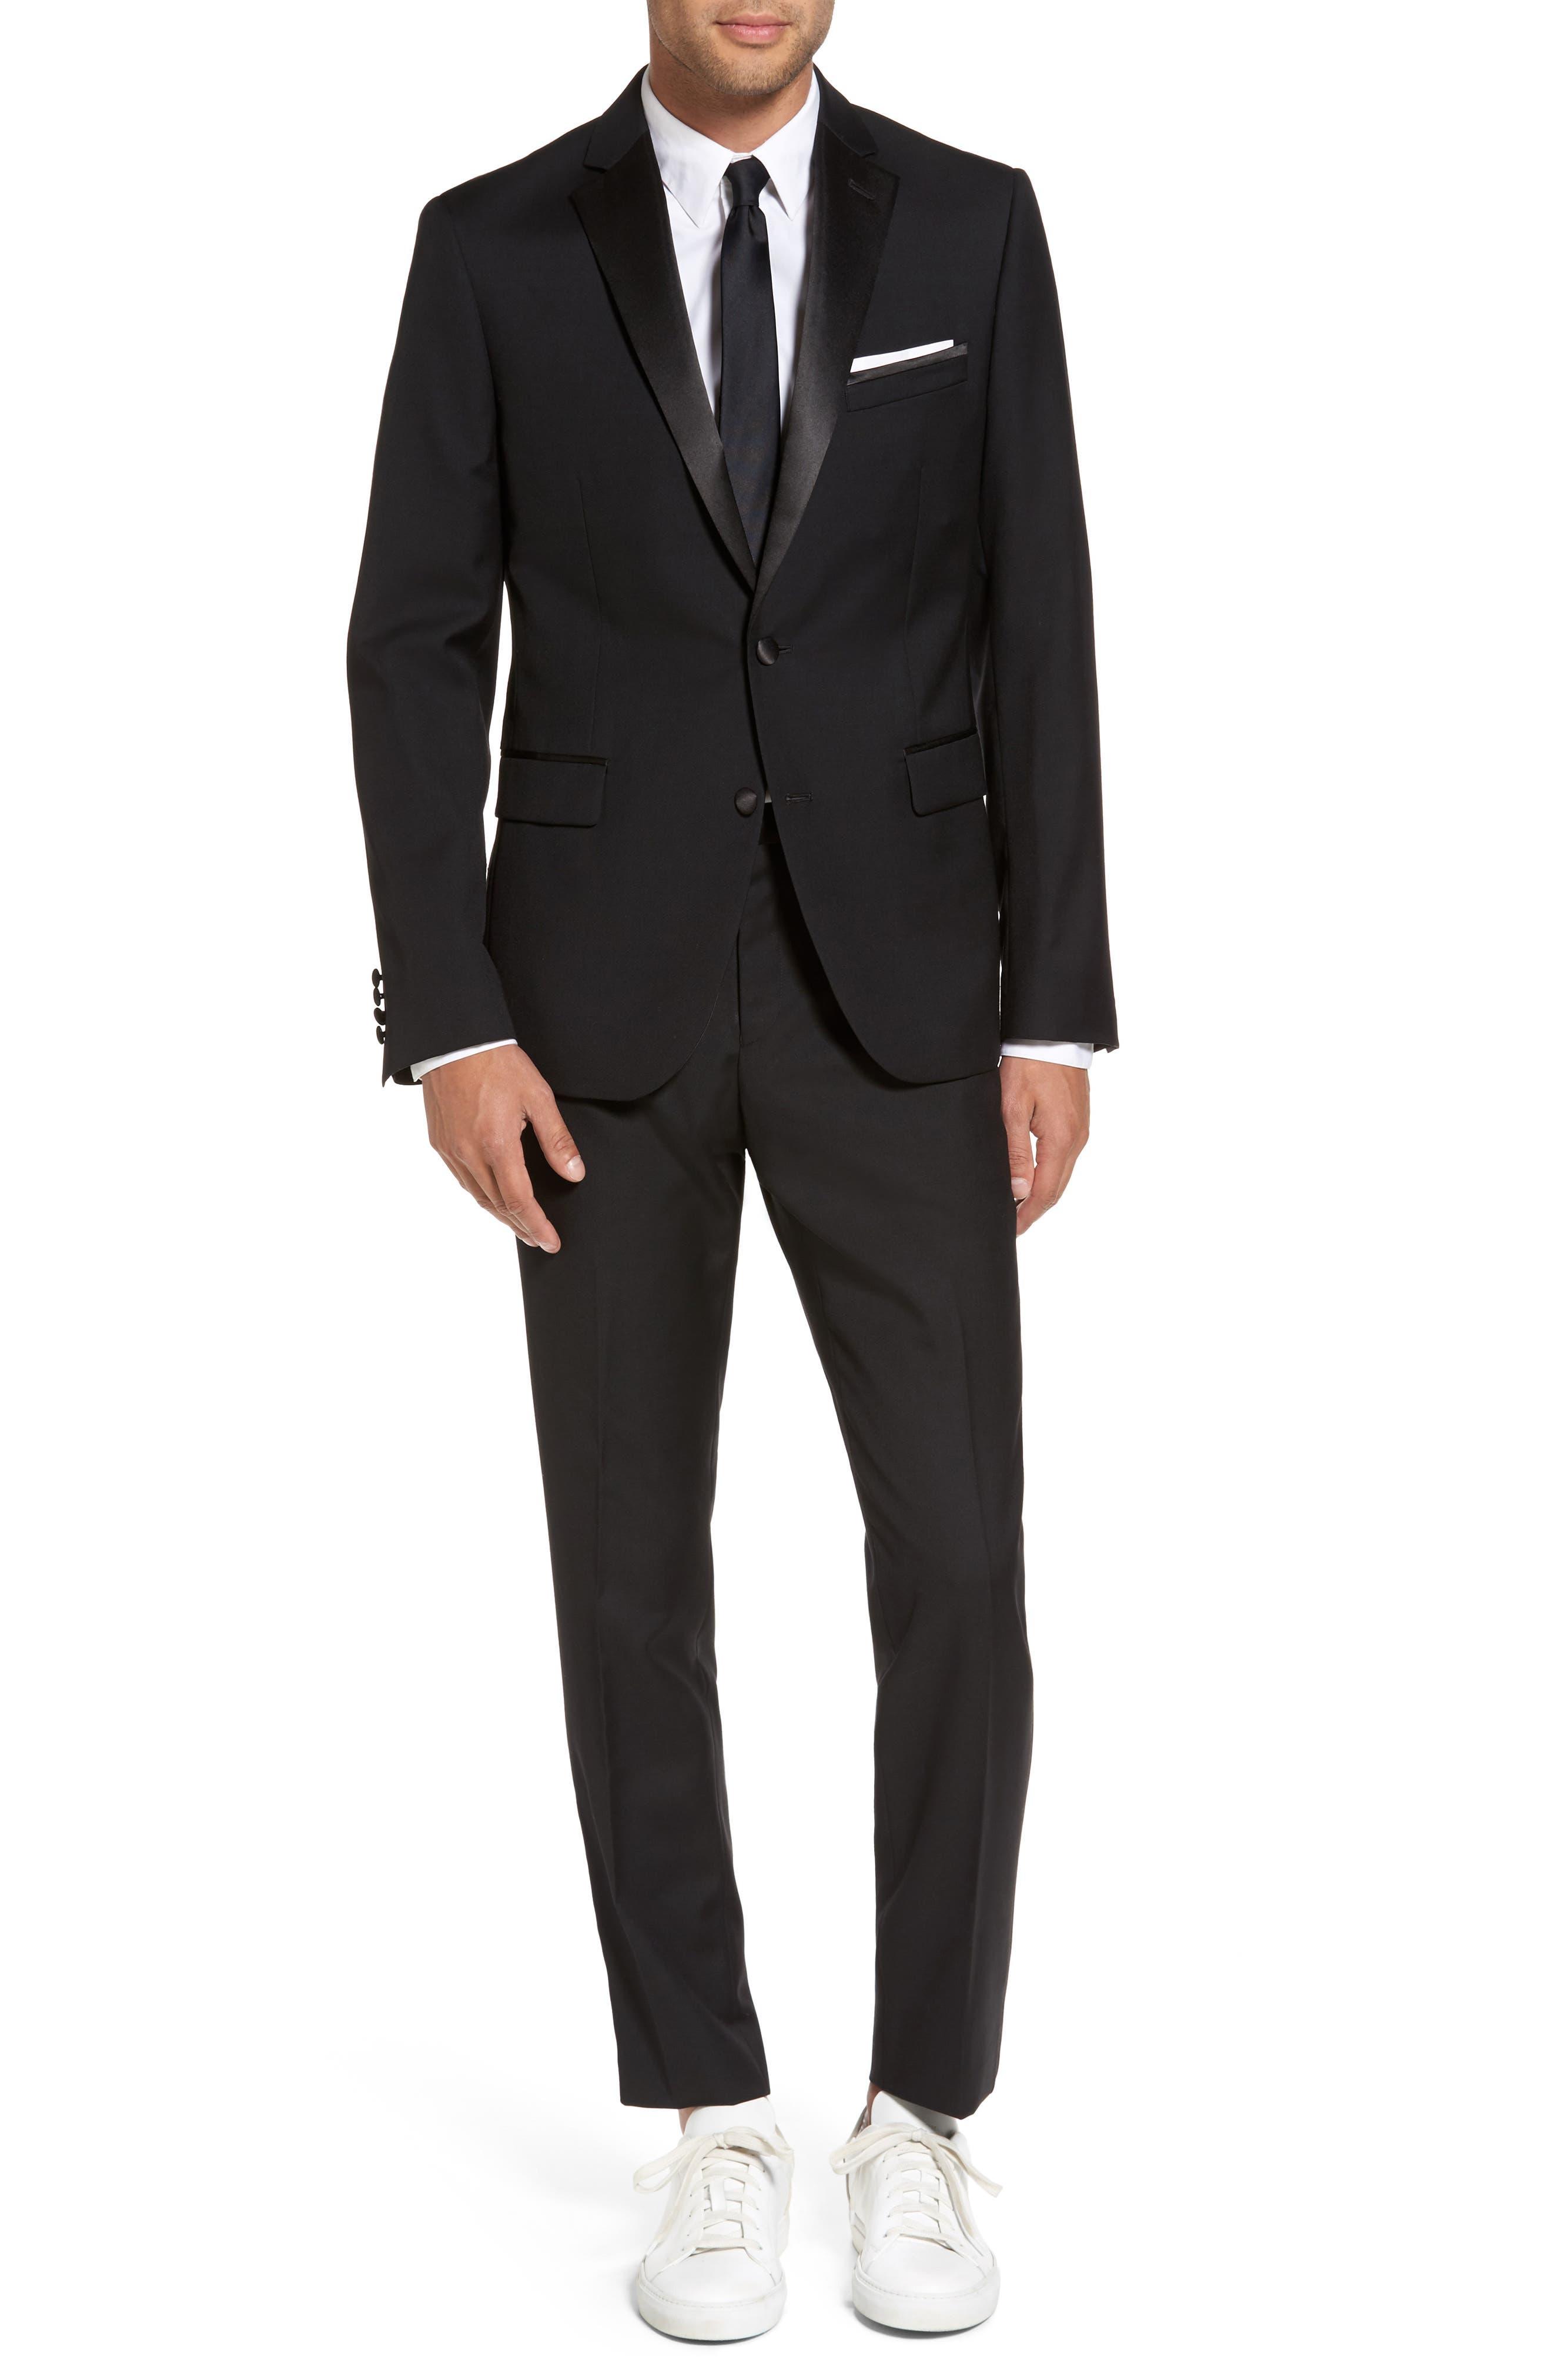 Main Image - Calibrate Trim Fit Wool Blend Tuxedo